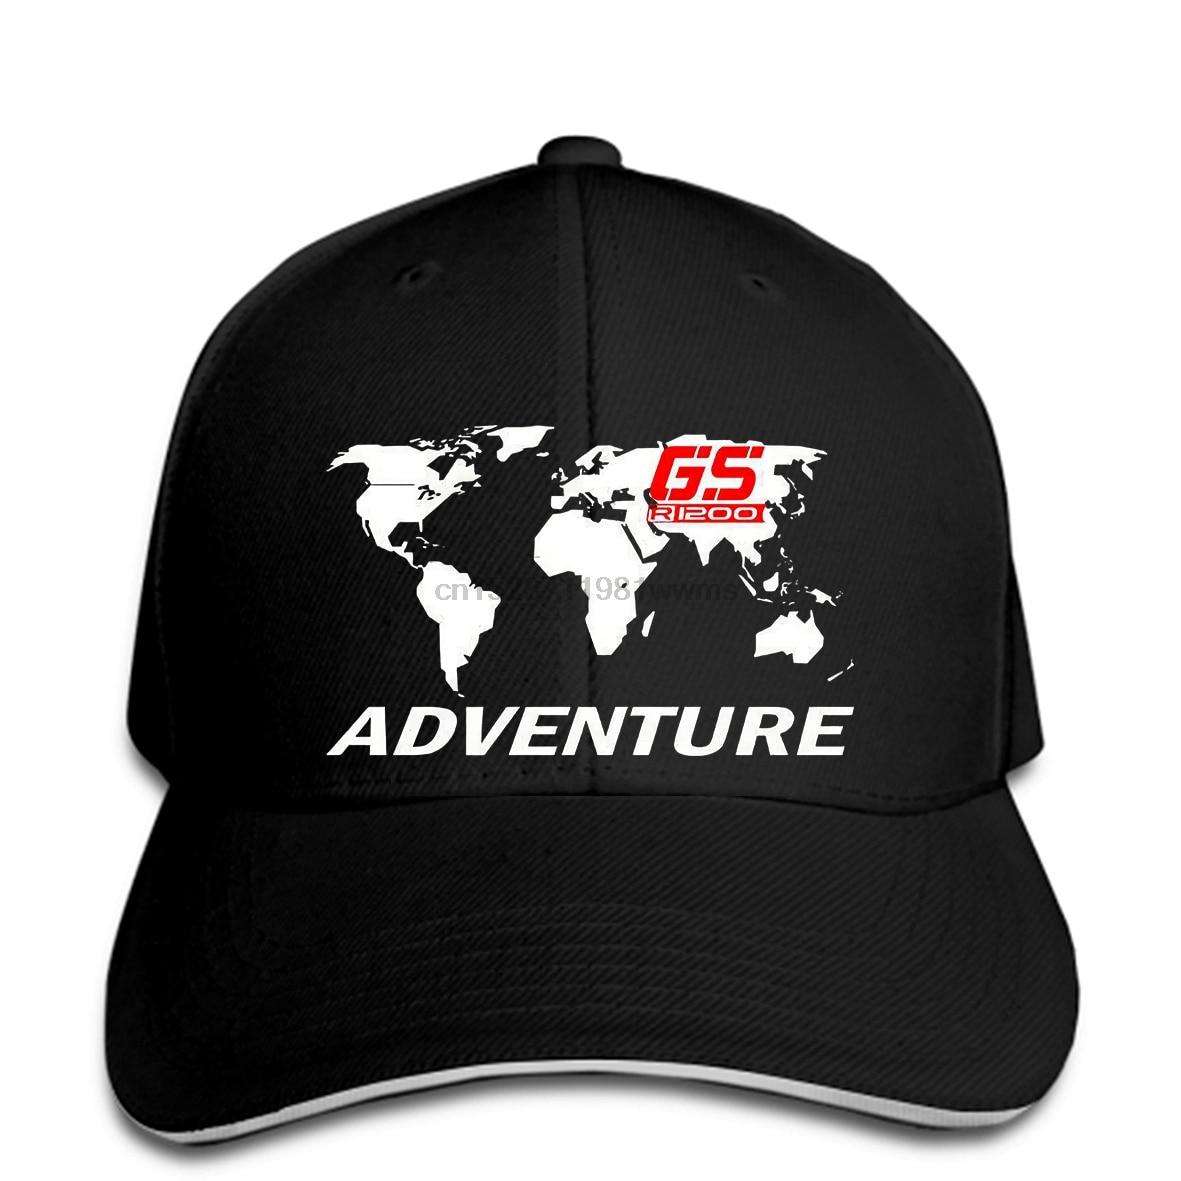 R1200GS бейсболка GS1200 Adventure One World ONE 1200 S солнцезащитный козырек|Мужские бейсболки| |